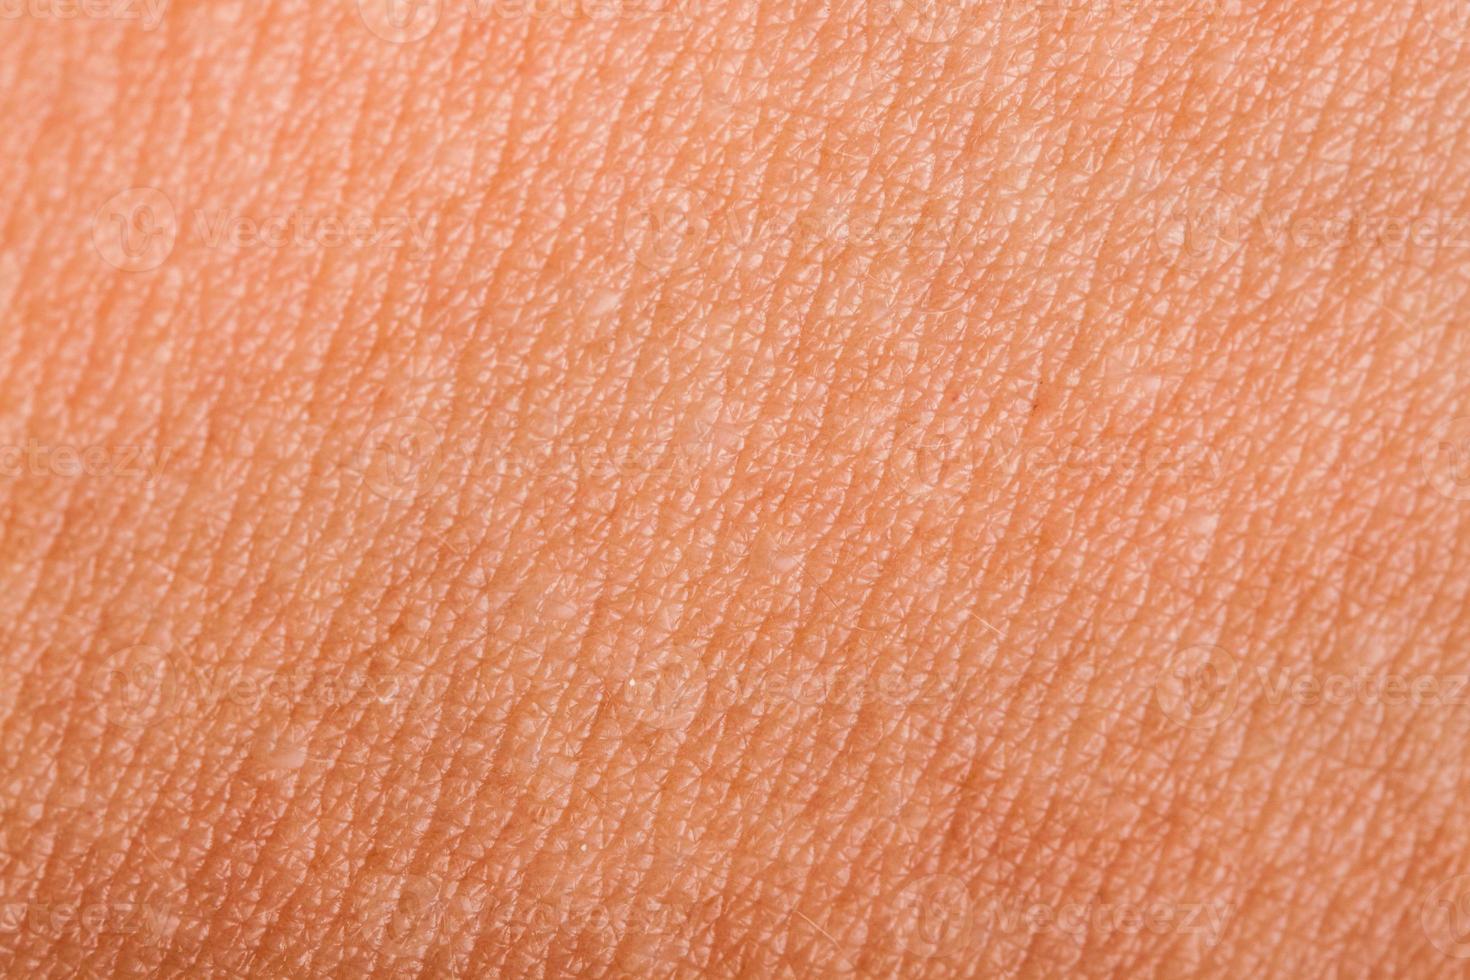 pelle umana da vicino foto